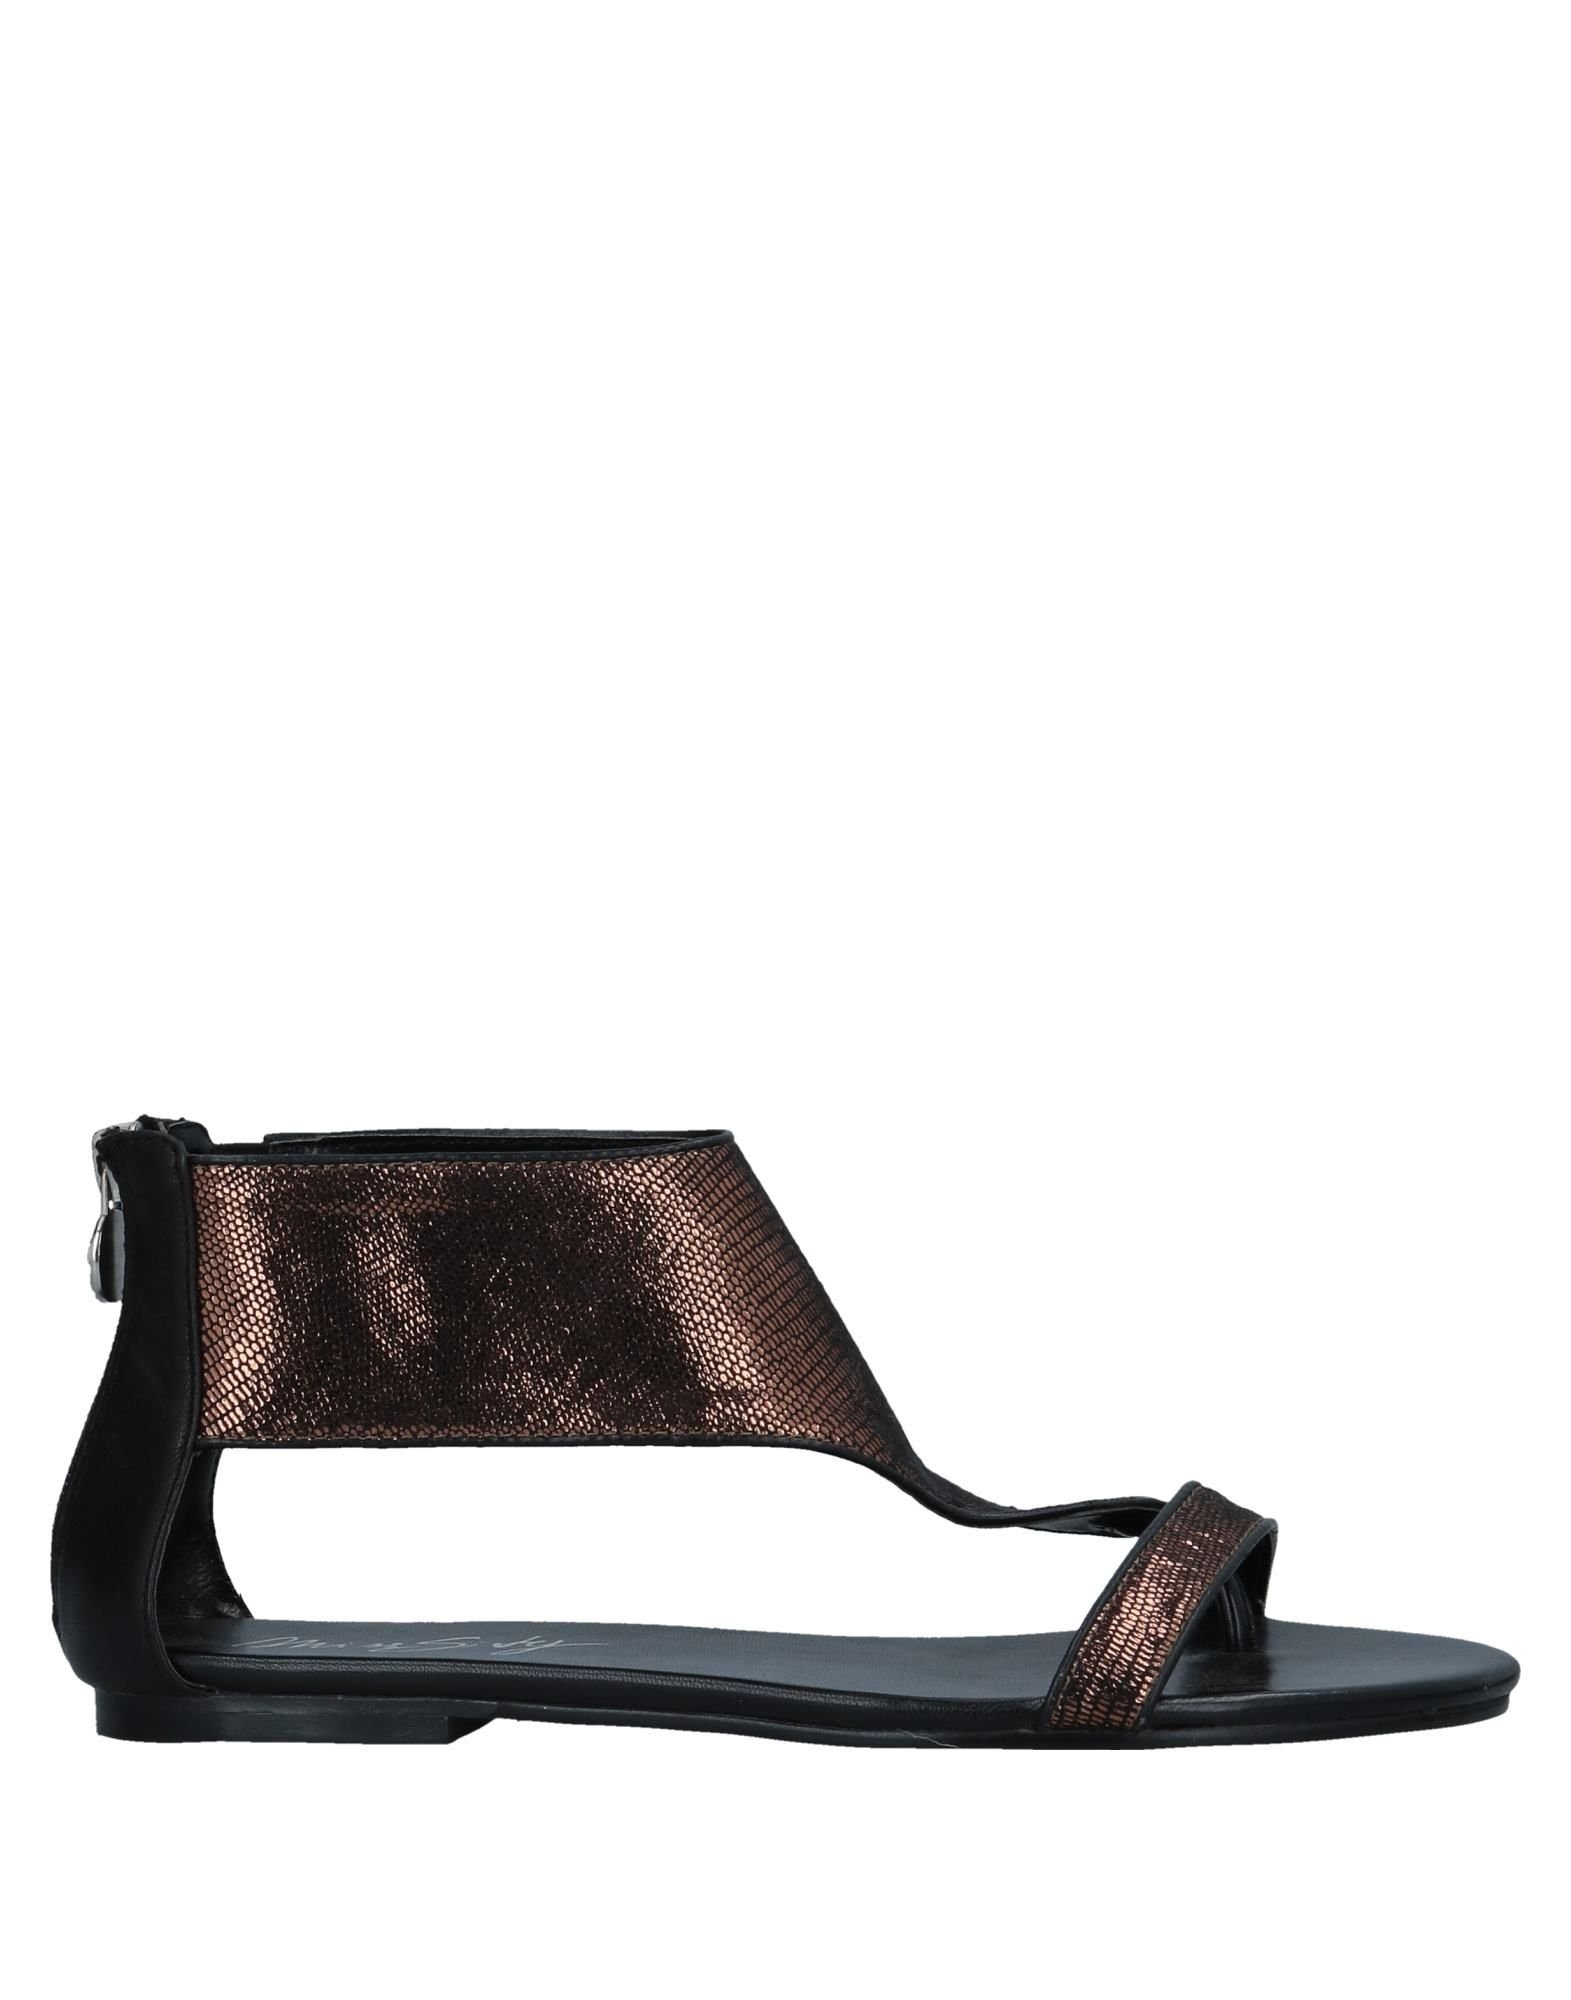 Miss Sixty Dianetten Damen  11525360GK Gute Qualität beliebte Schuhe